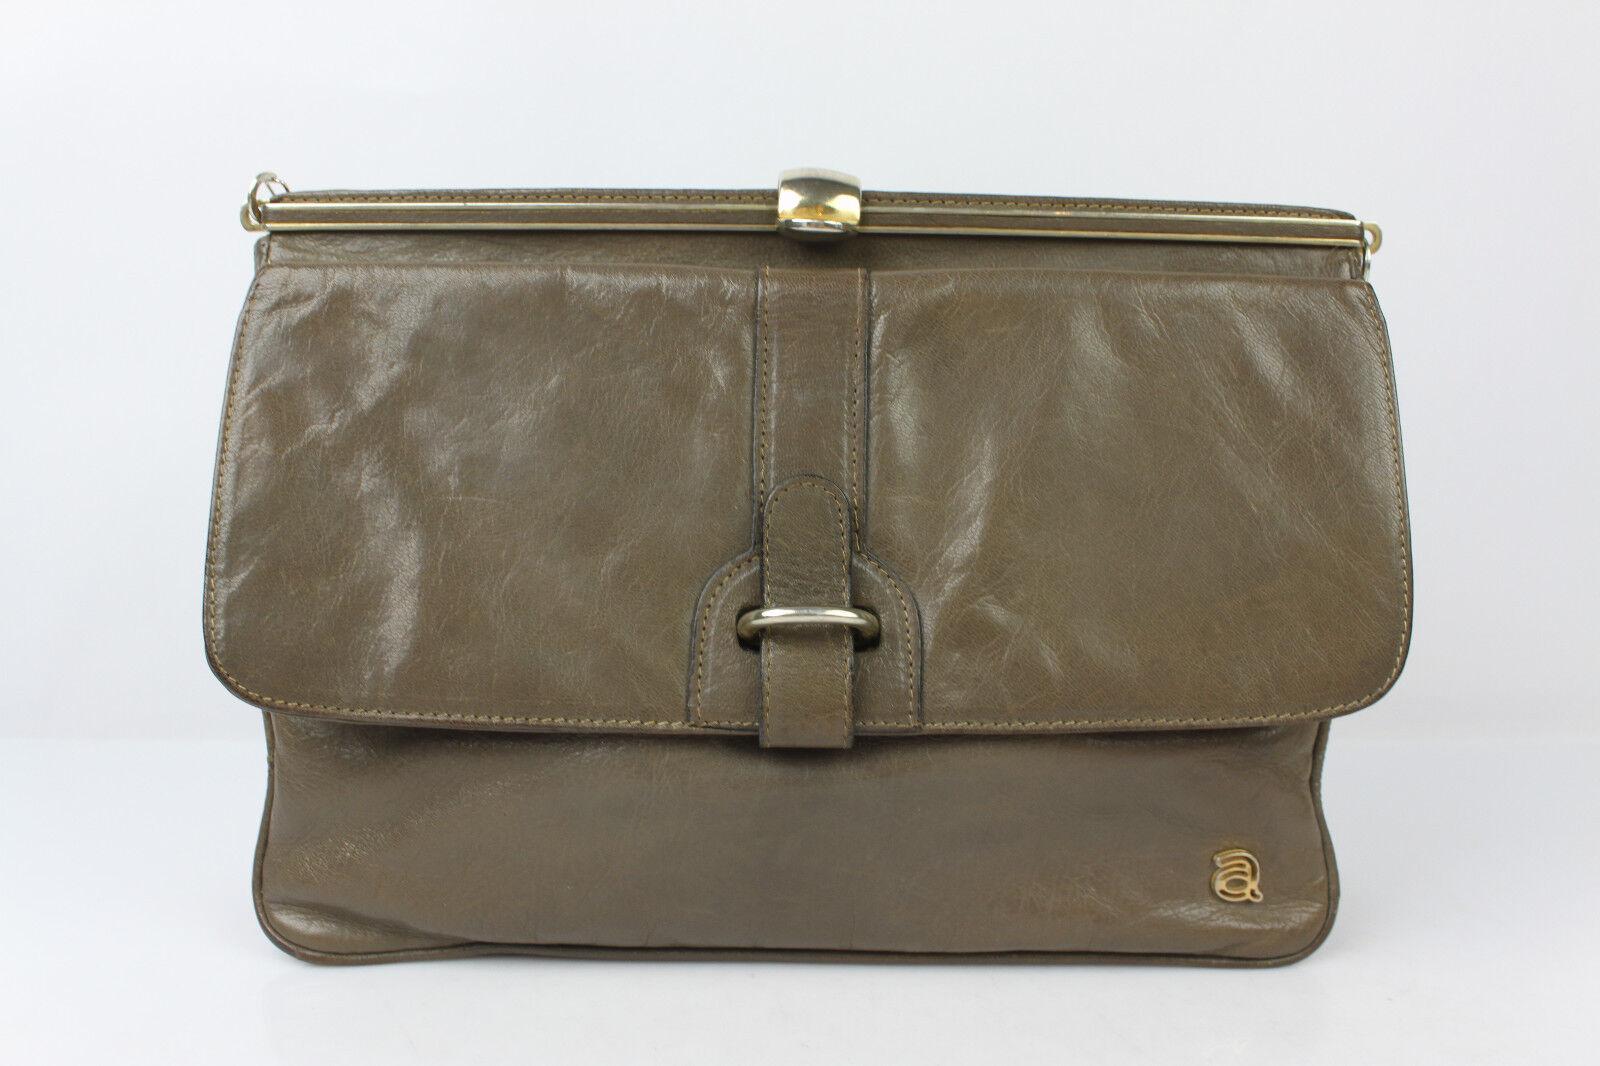 508b6cfdd4713 VINTAGE Clutch Clutch Clutch Tasche ANDRE Leder Taupe SEHT GUTER ZUSTAND